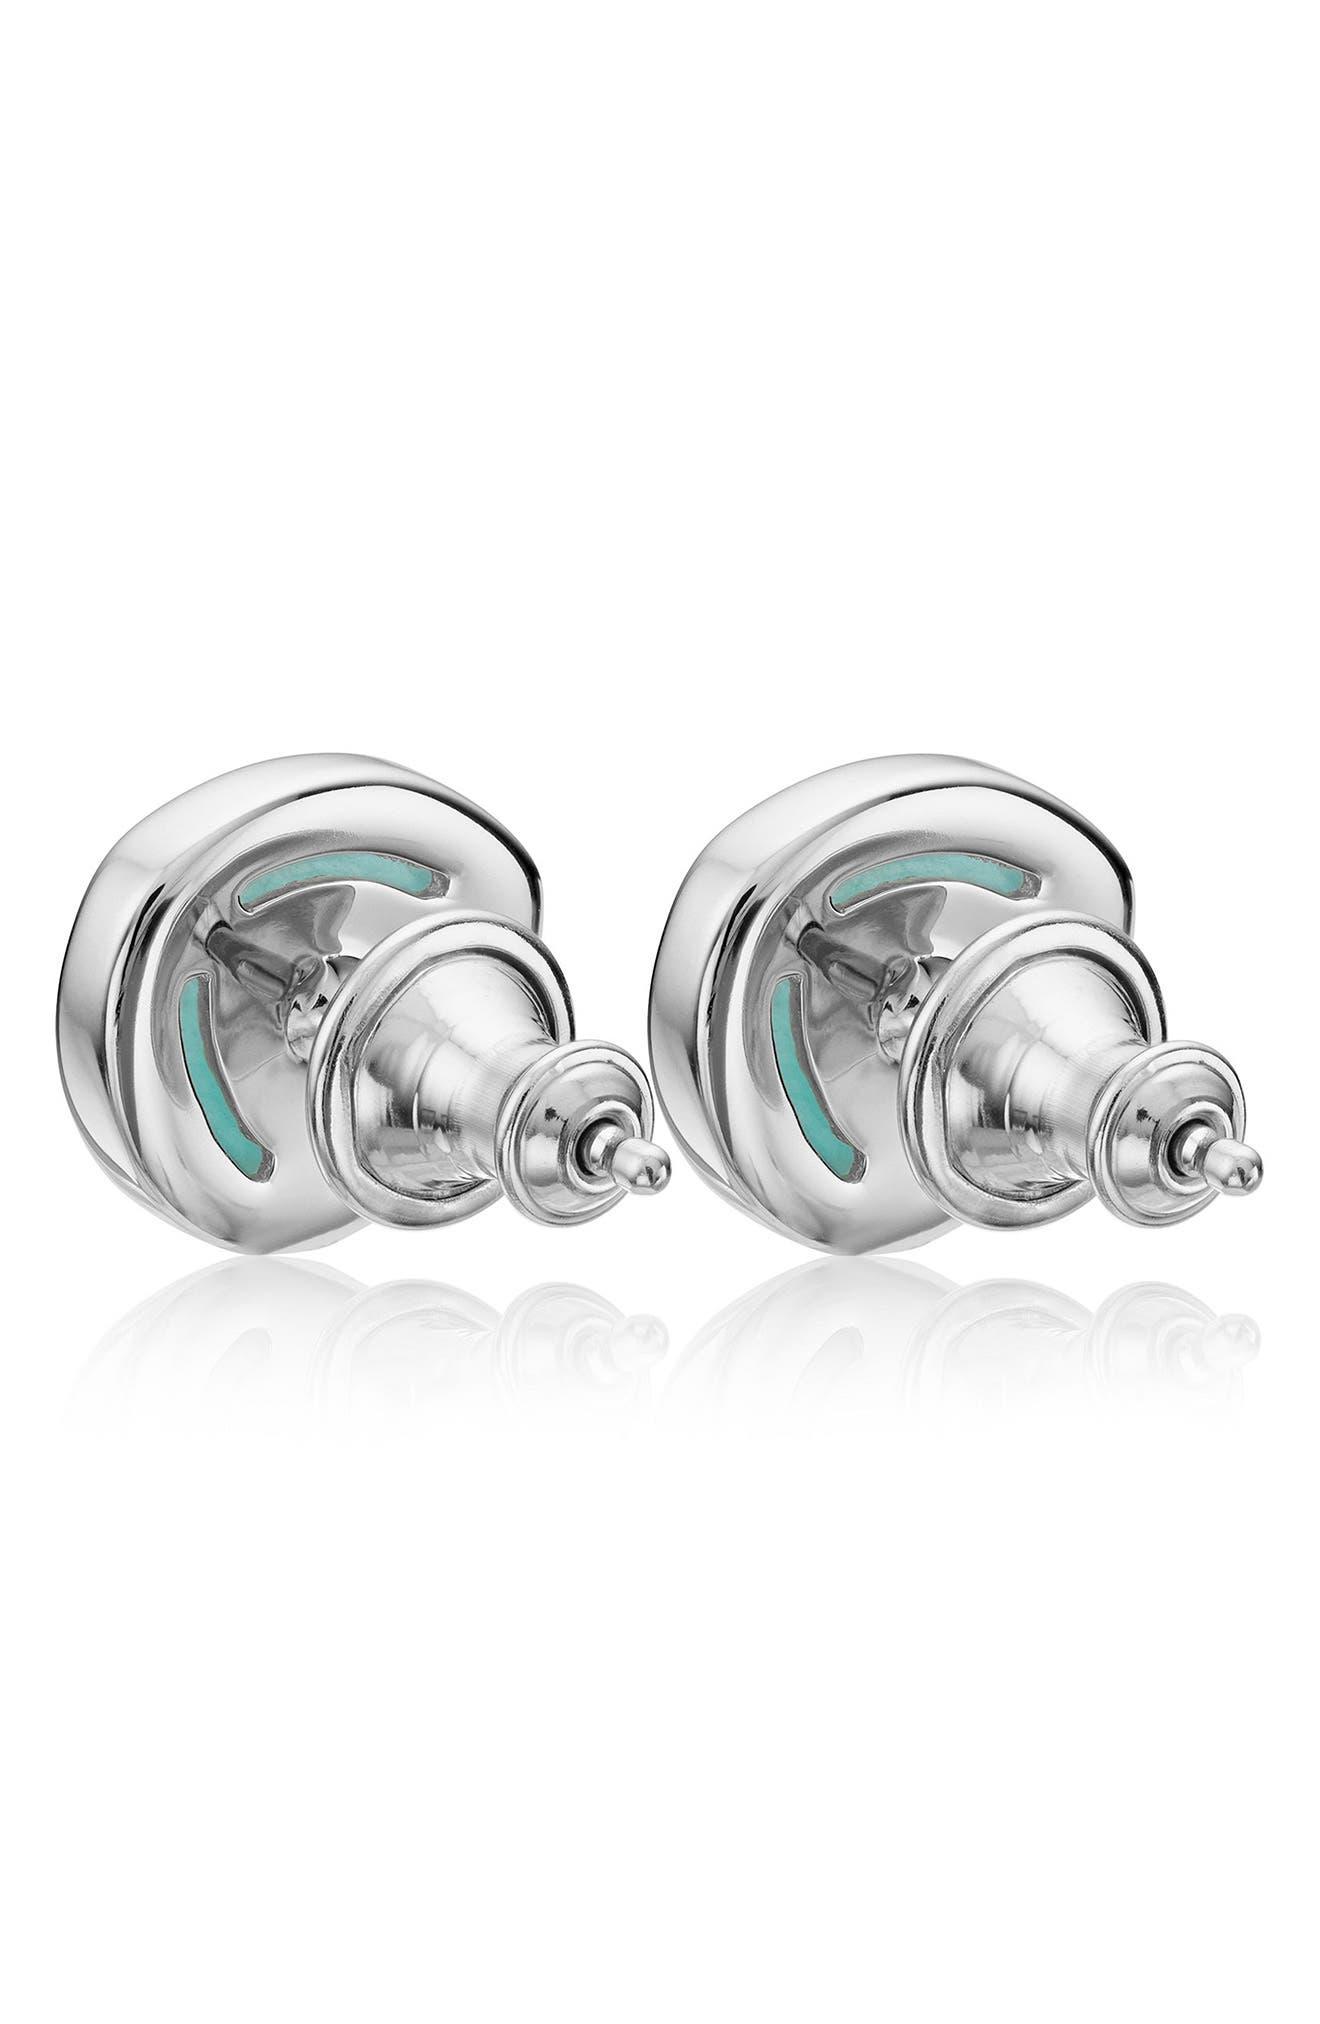 Siren Stud Earrings,                             Alternate thumbnail 3, color,                             SILVER/ AMAZONITE